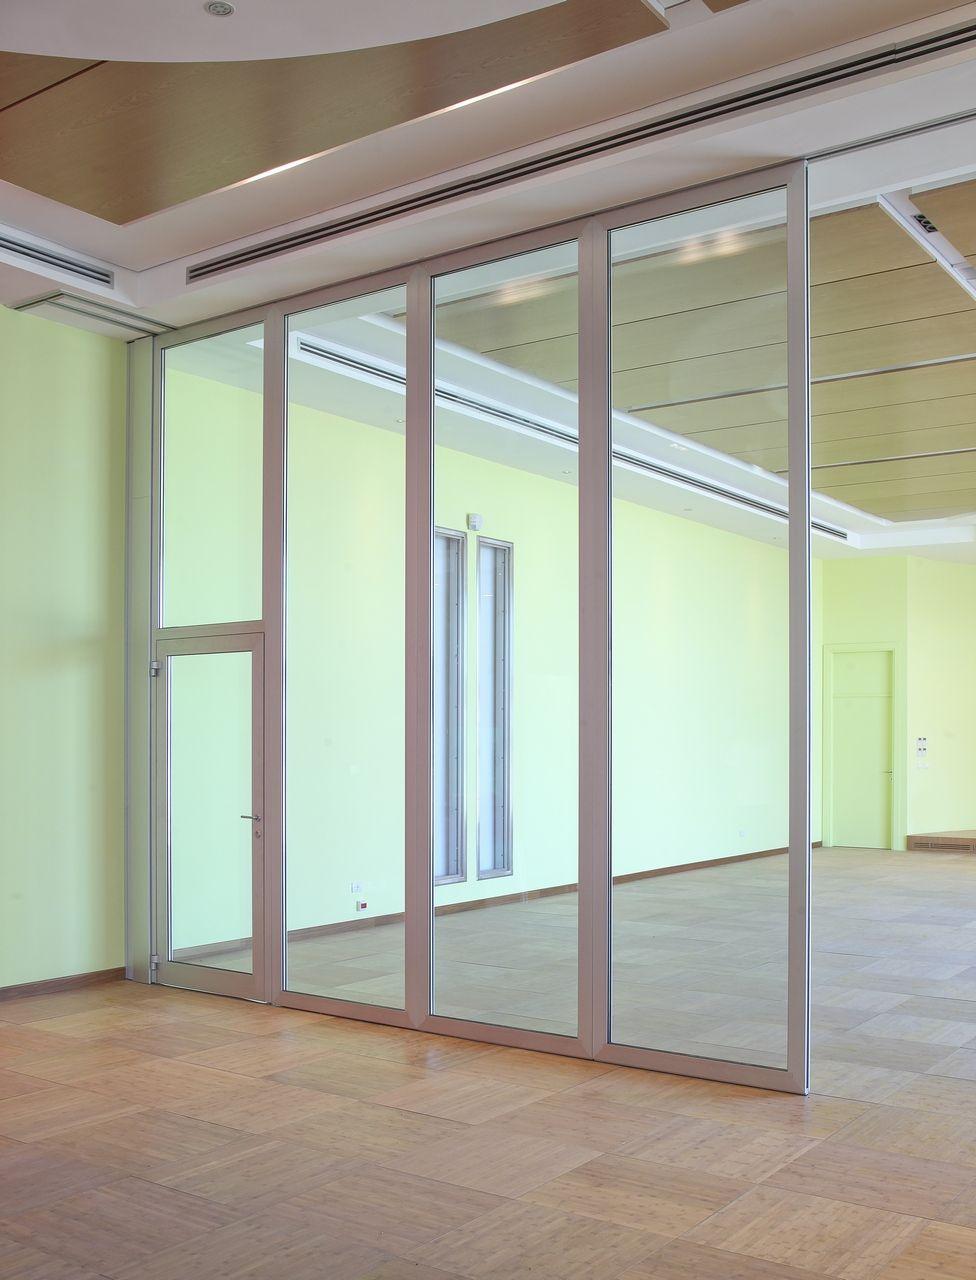 Mampara divisoria ac stica m vil de vidrio moveable - Mampara de vidrio ...